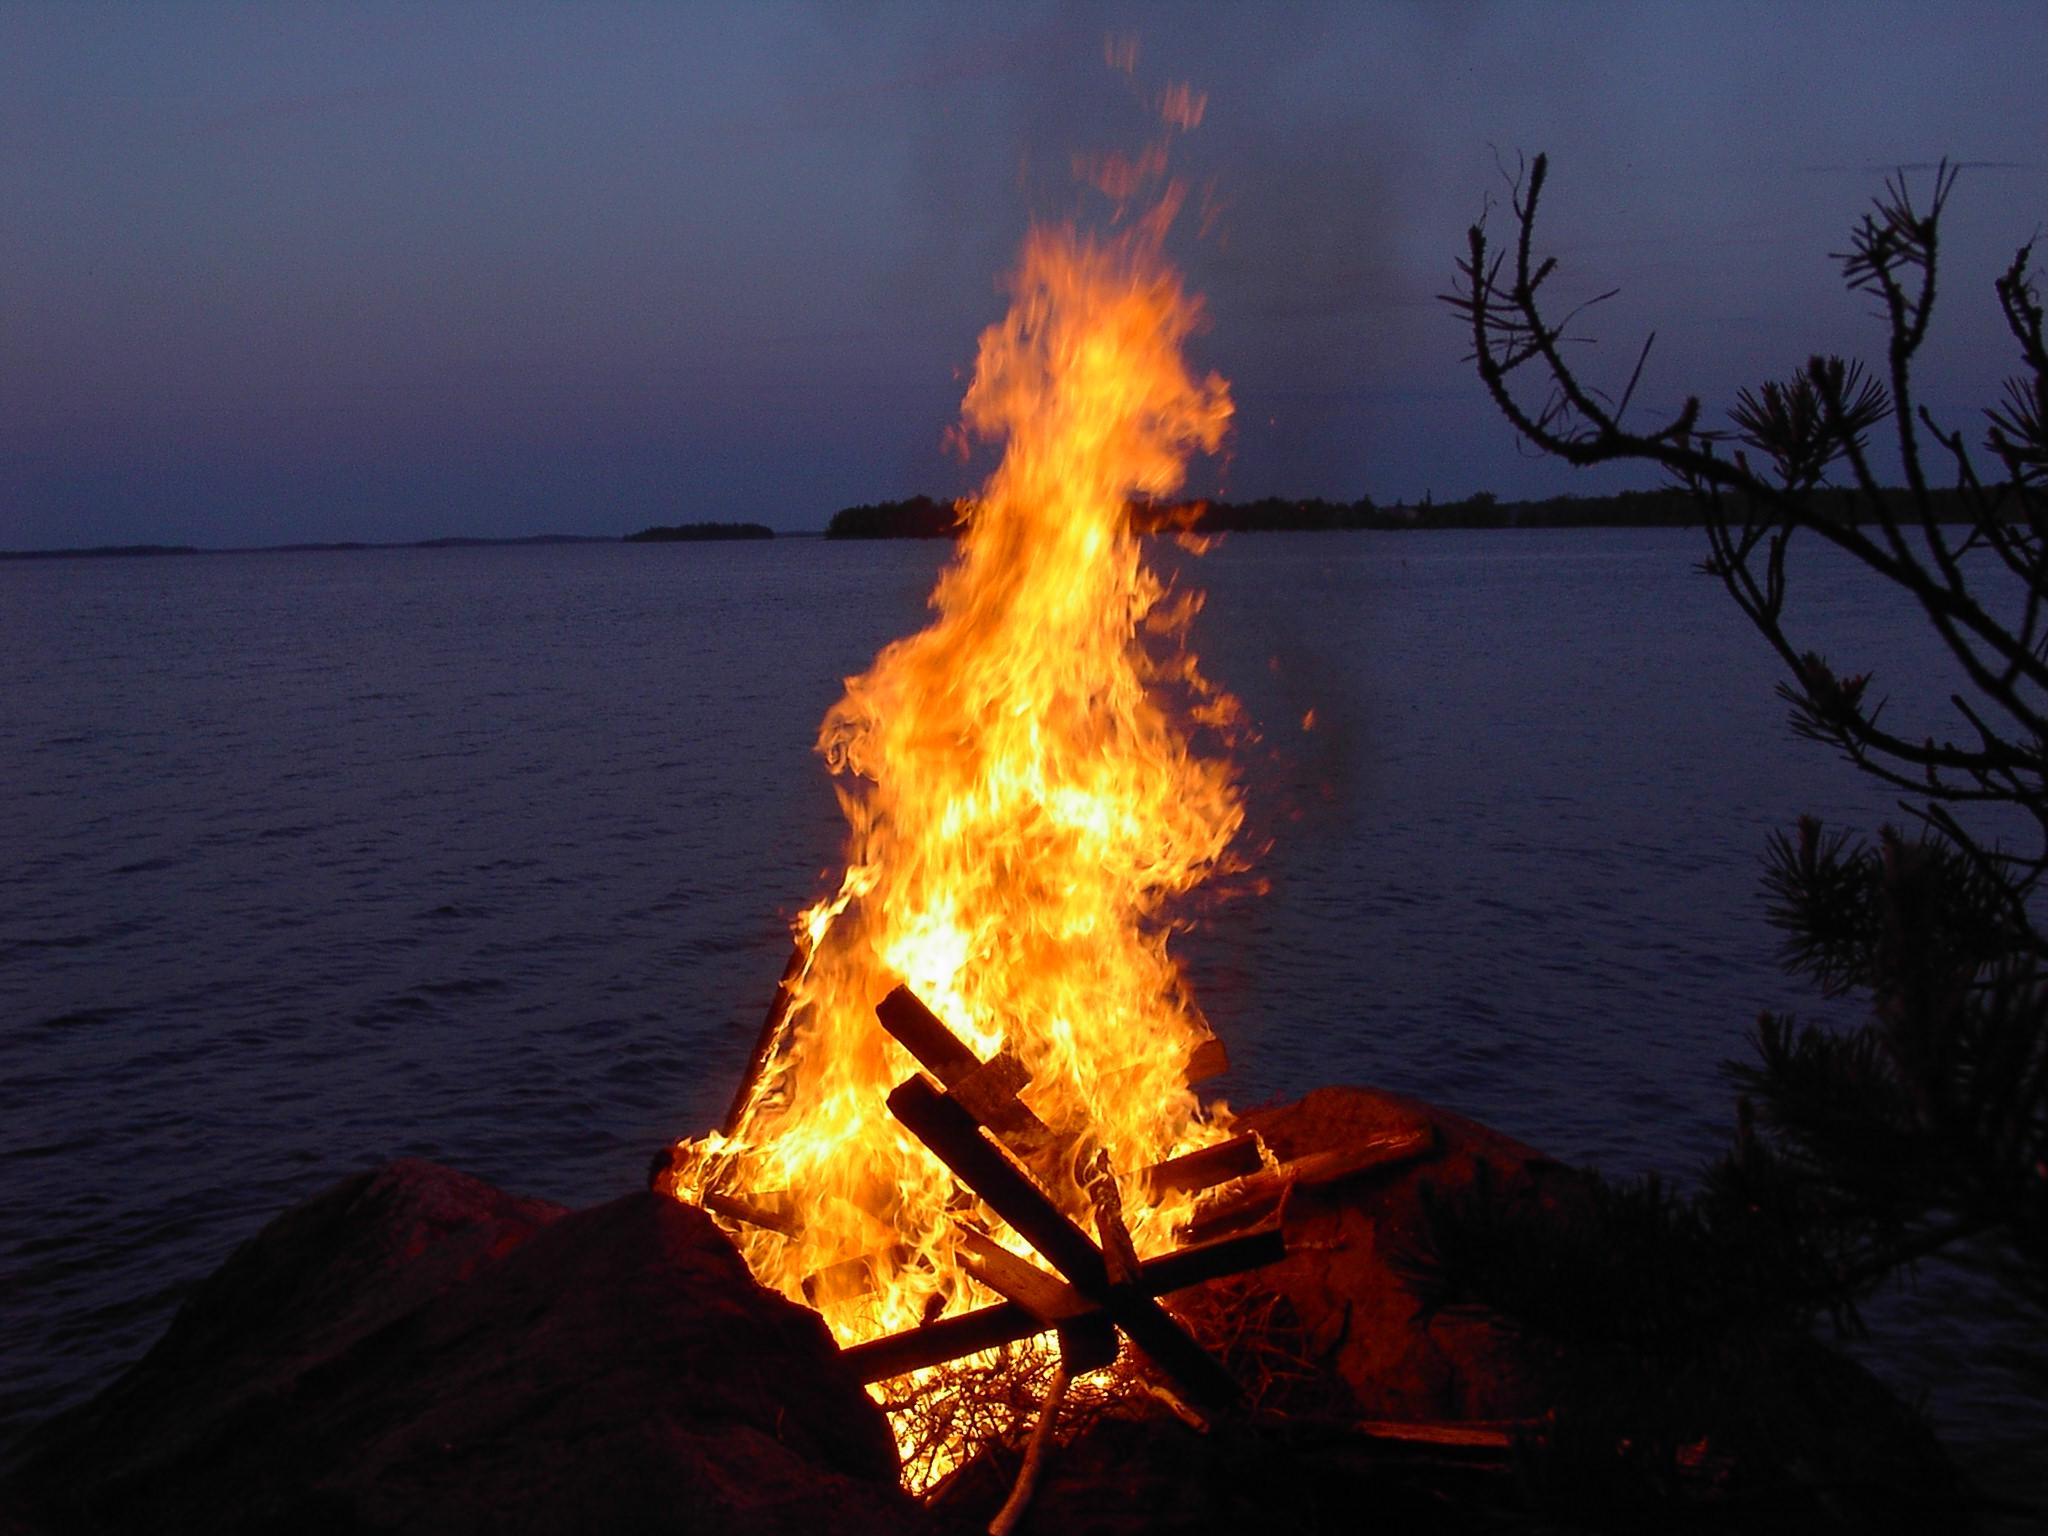 File:Midsummer bonfire in Pielavasi, Finland.JPG - Wikipedia